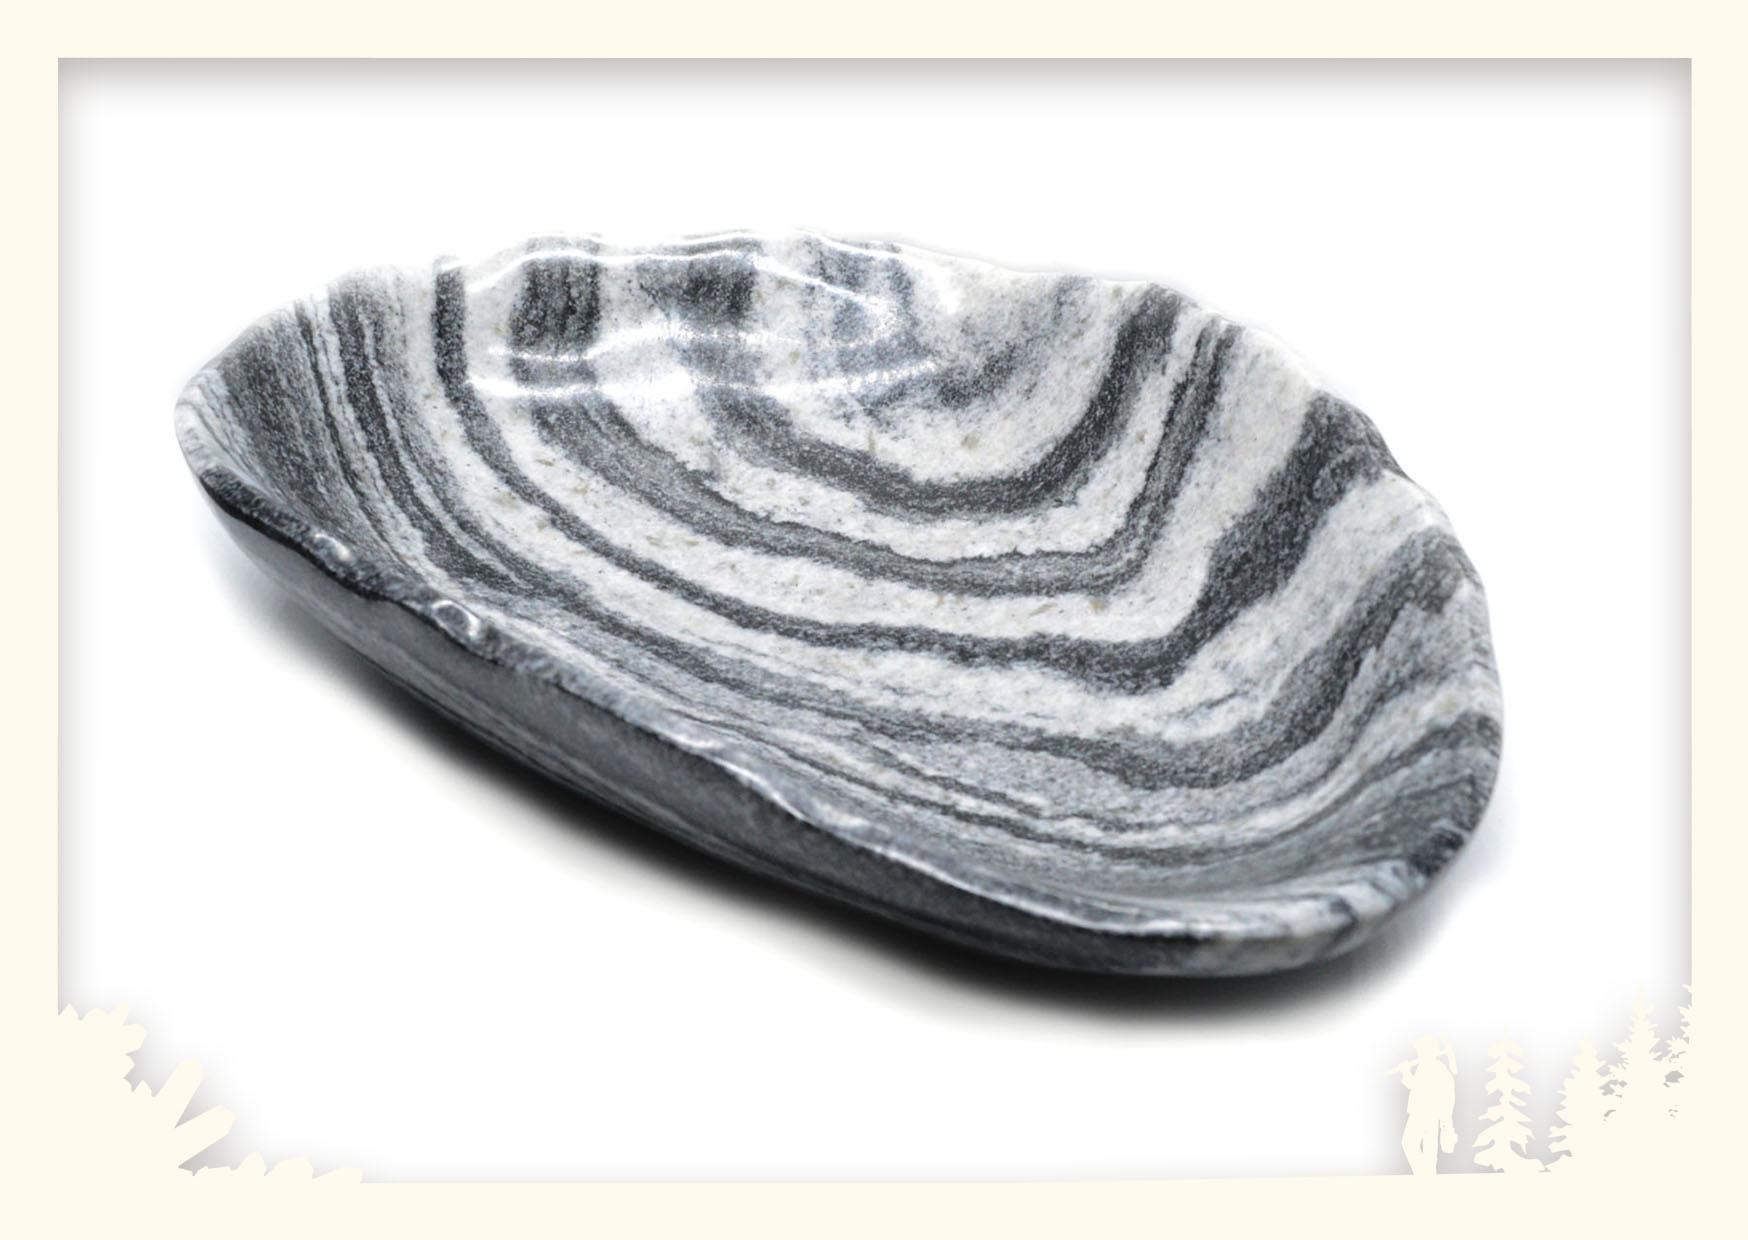 Steinschale Marmor Wachau Image